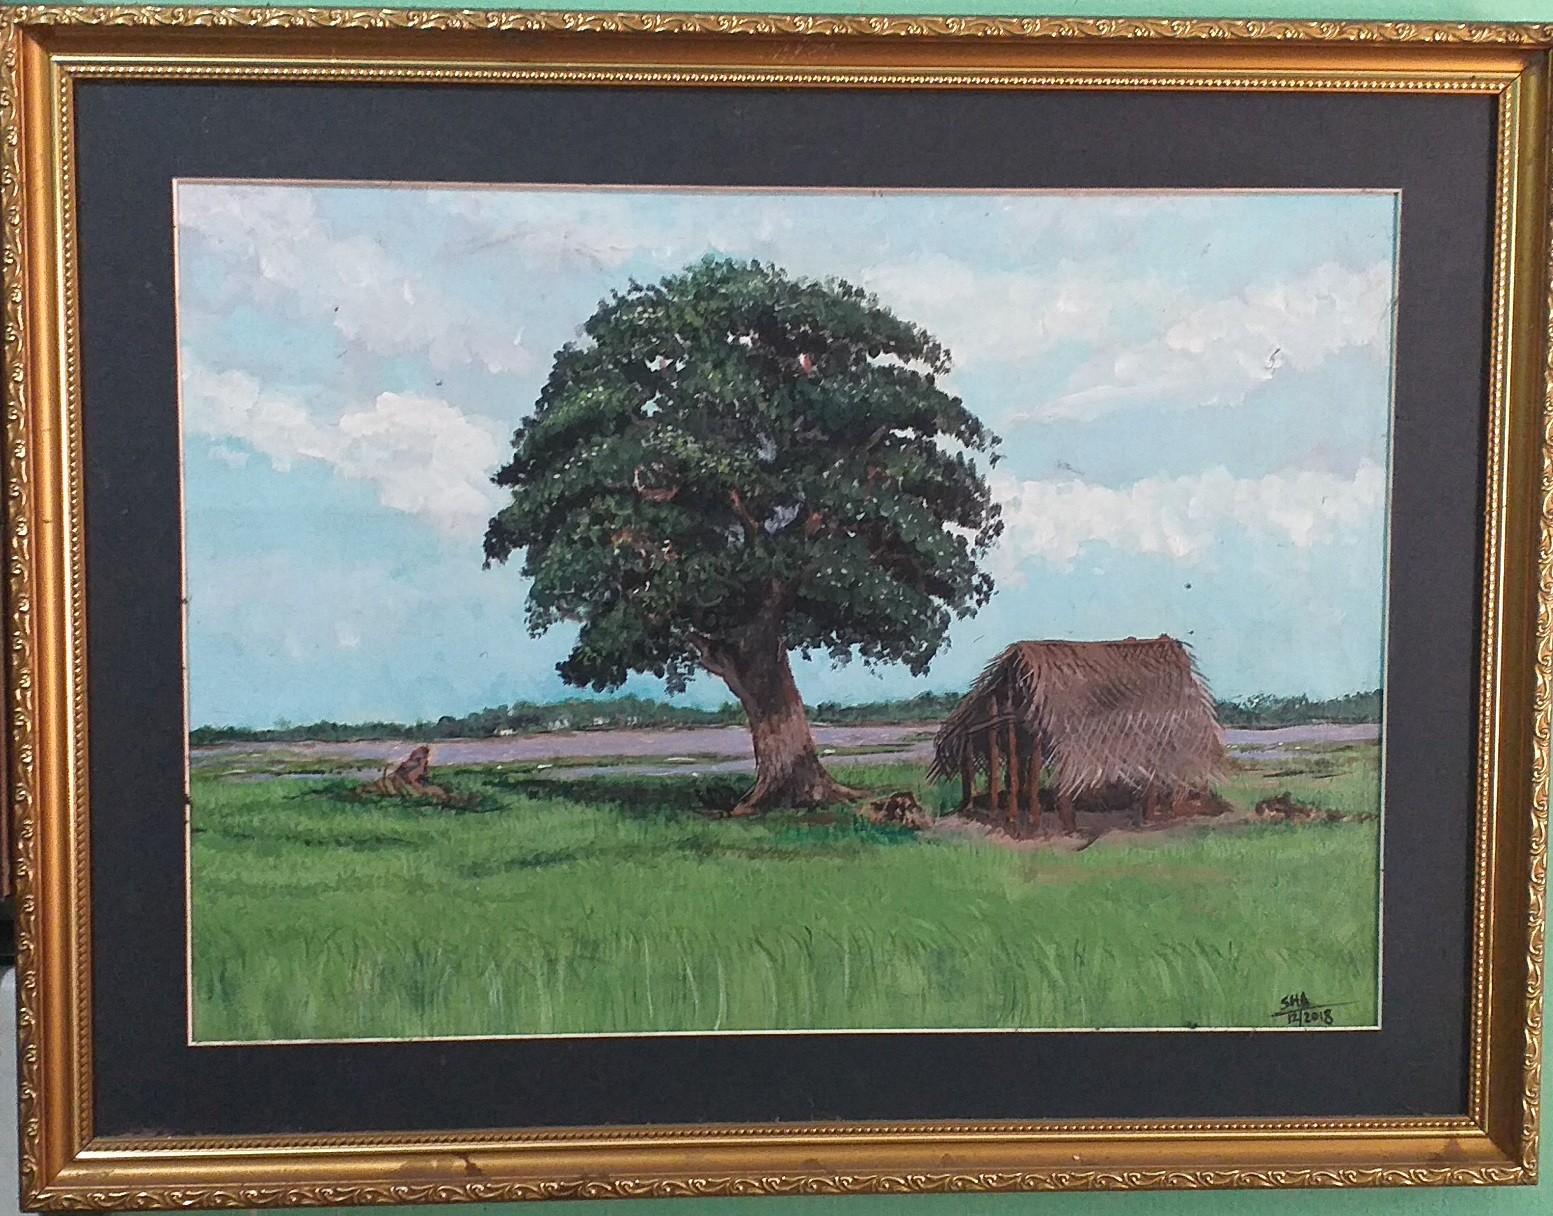 Tree and shelter by Shamali Wickramasinghe